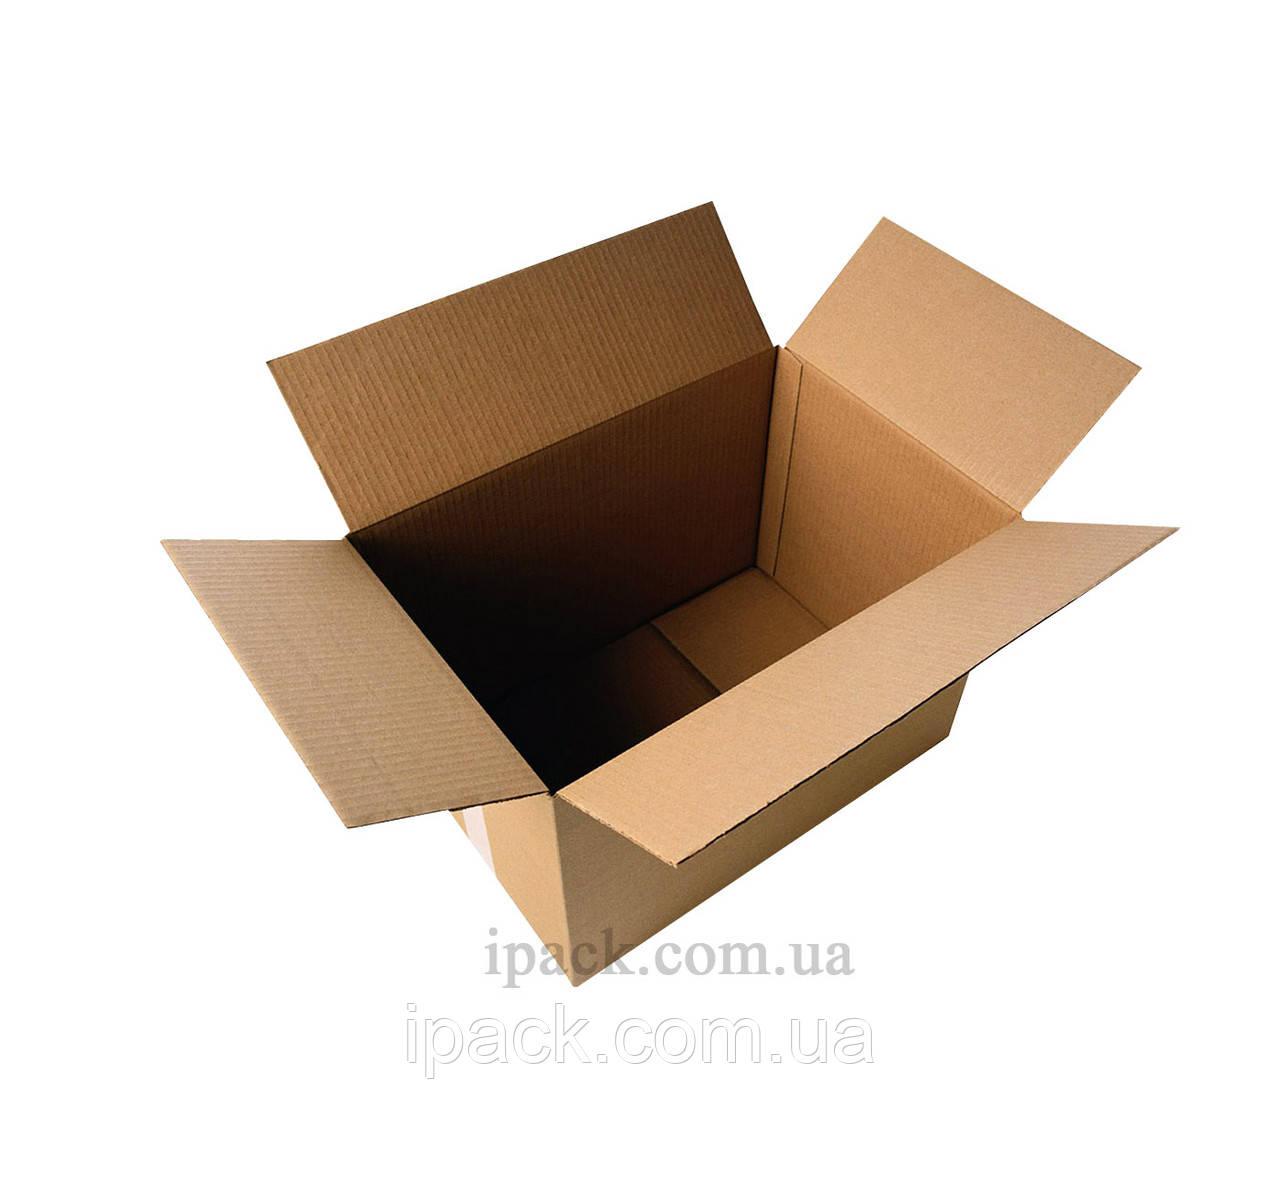 Гофроящик 305*185*245 мм, бурый, четырехклапанный картонный короб